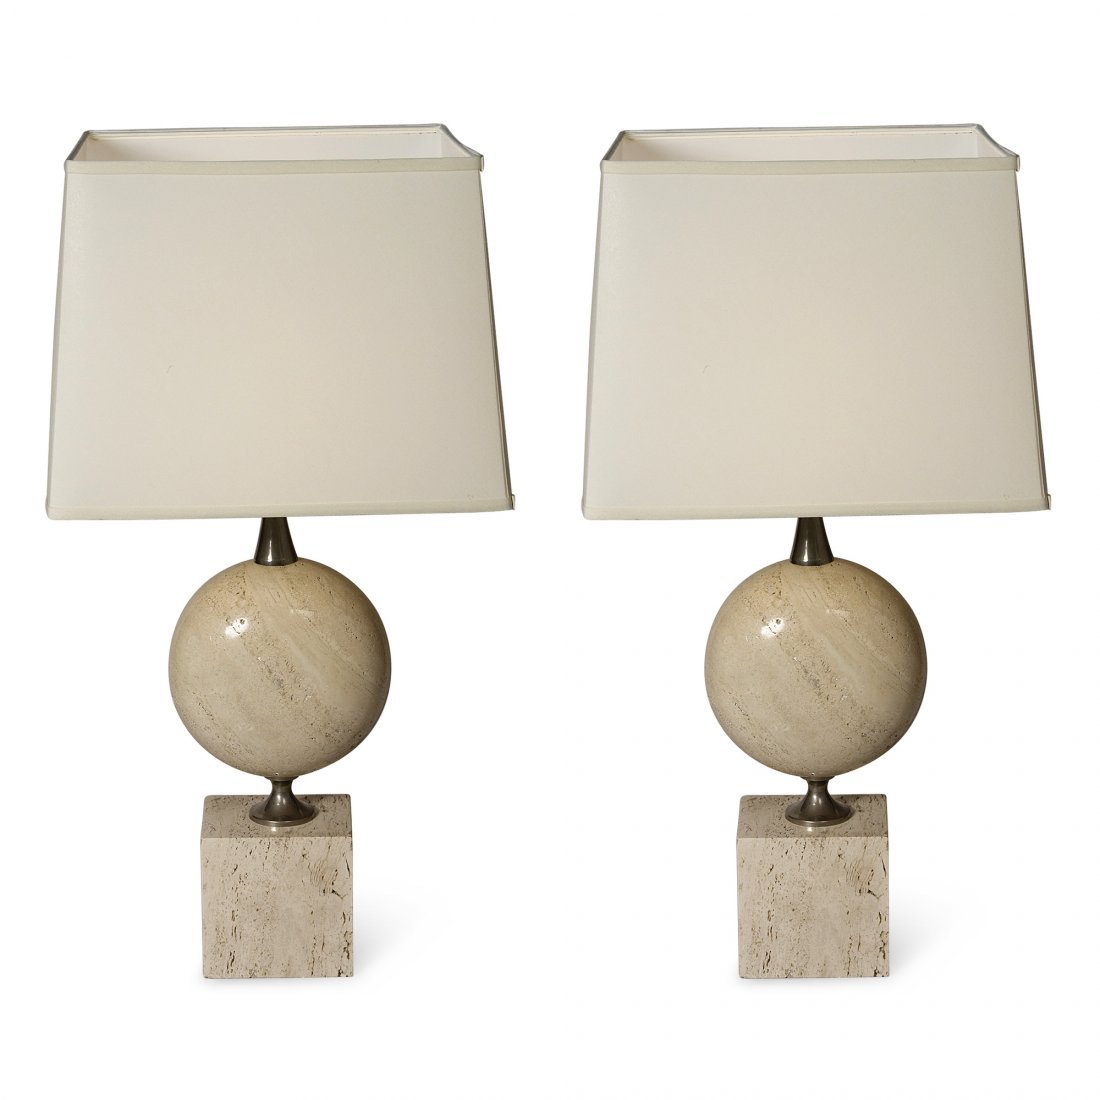 Pair of Barbier Lamps